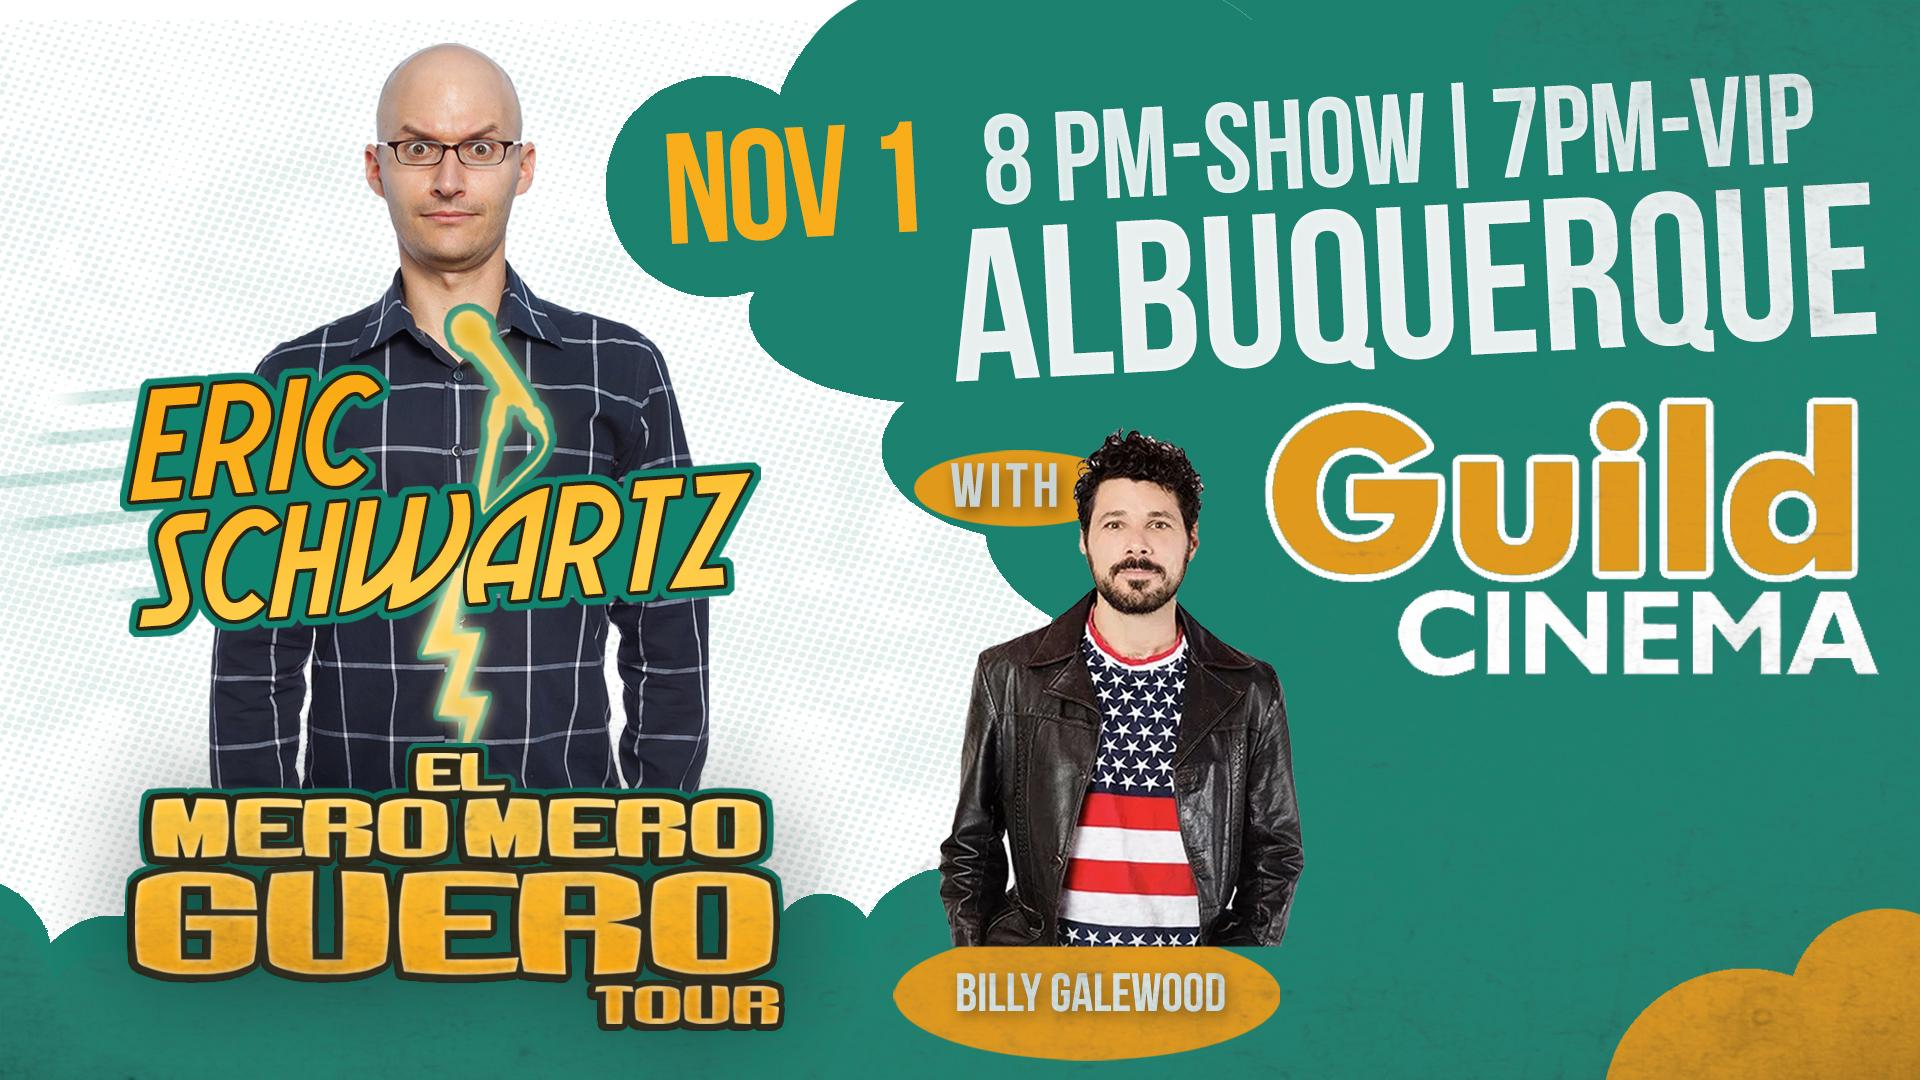 Eric Schwartz Mero Mero Guero Tour - Albuquerque, NM